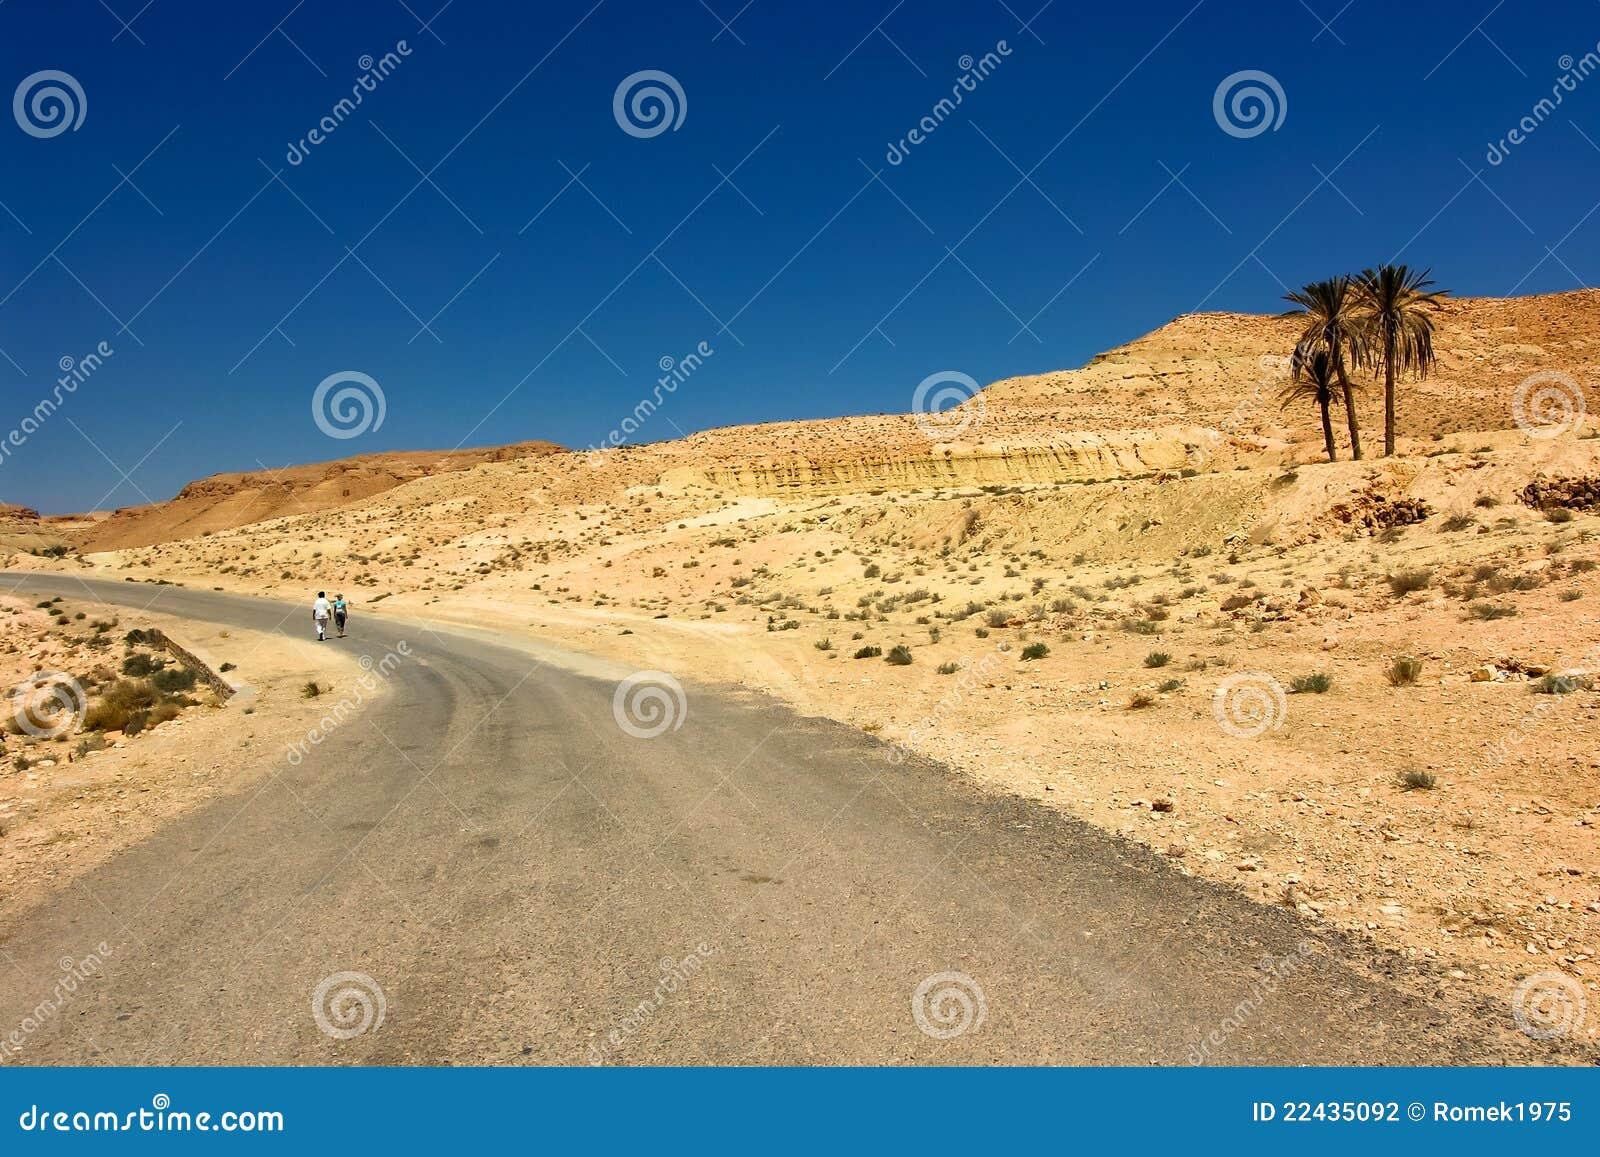 Image of: Image Desert Travelers In Tunisia Dreamstimecom Desert Travelers In Tunisia Stock Photo Image Of Empty Tourists